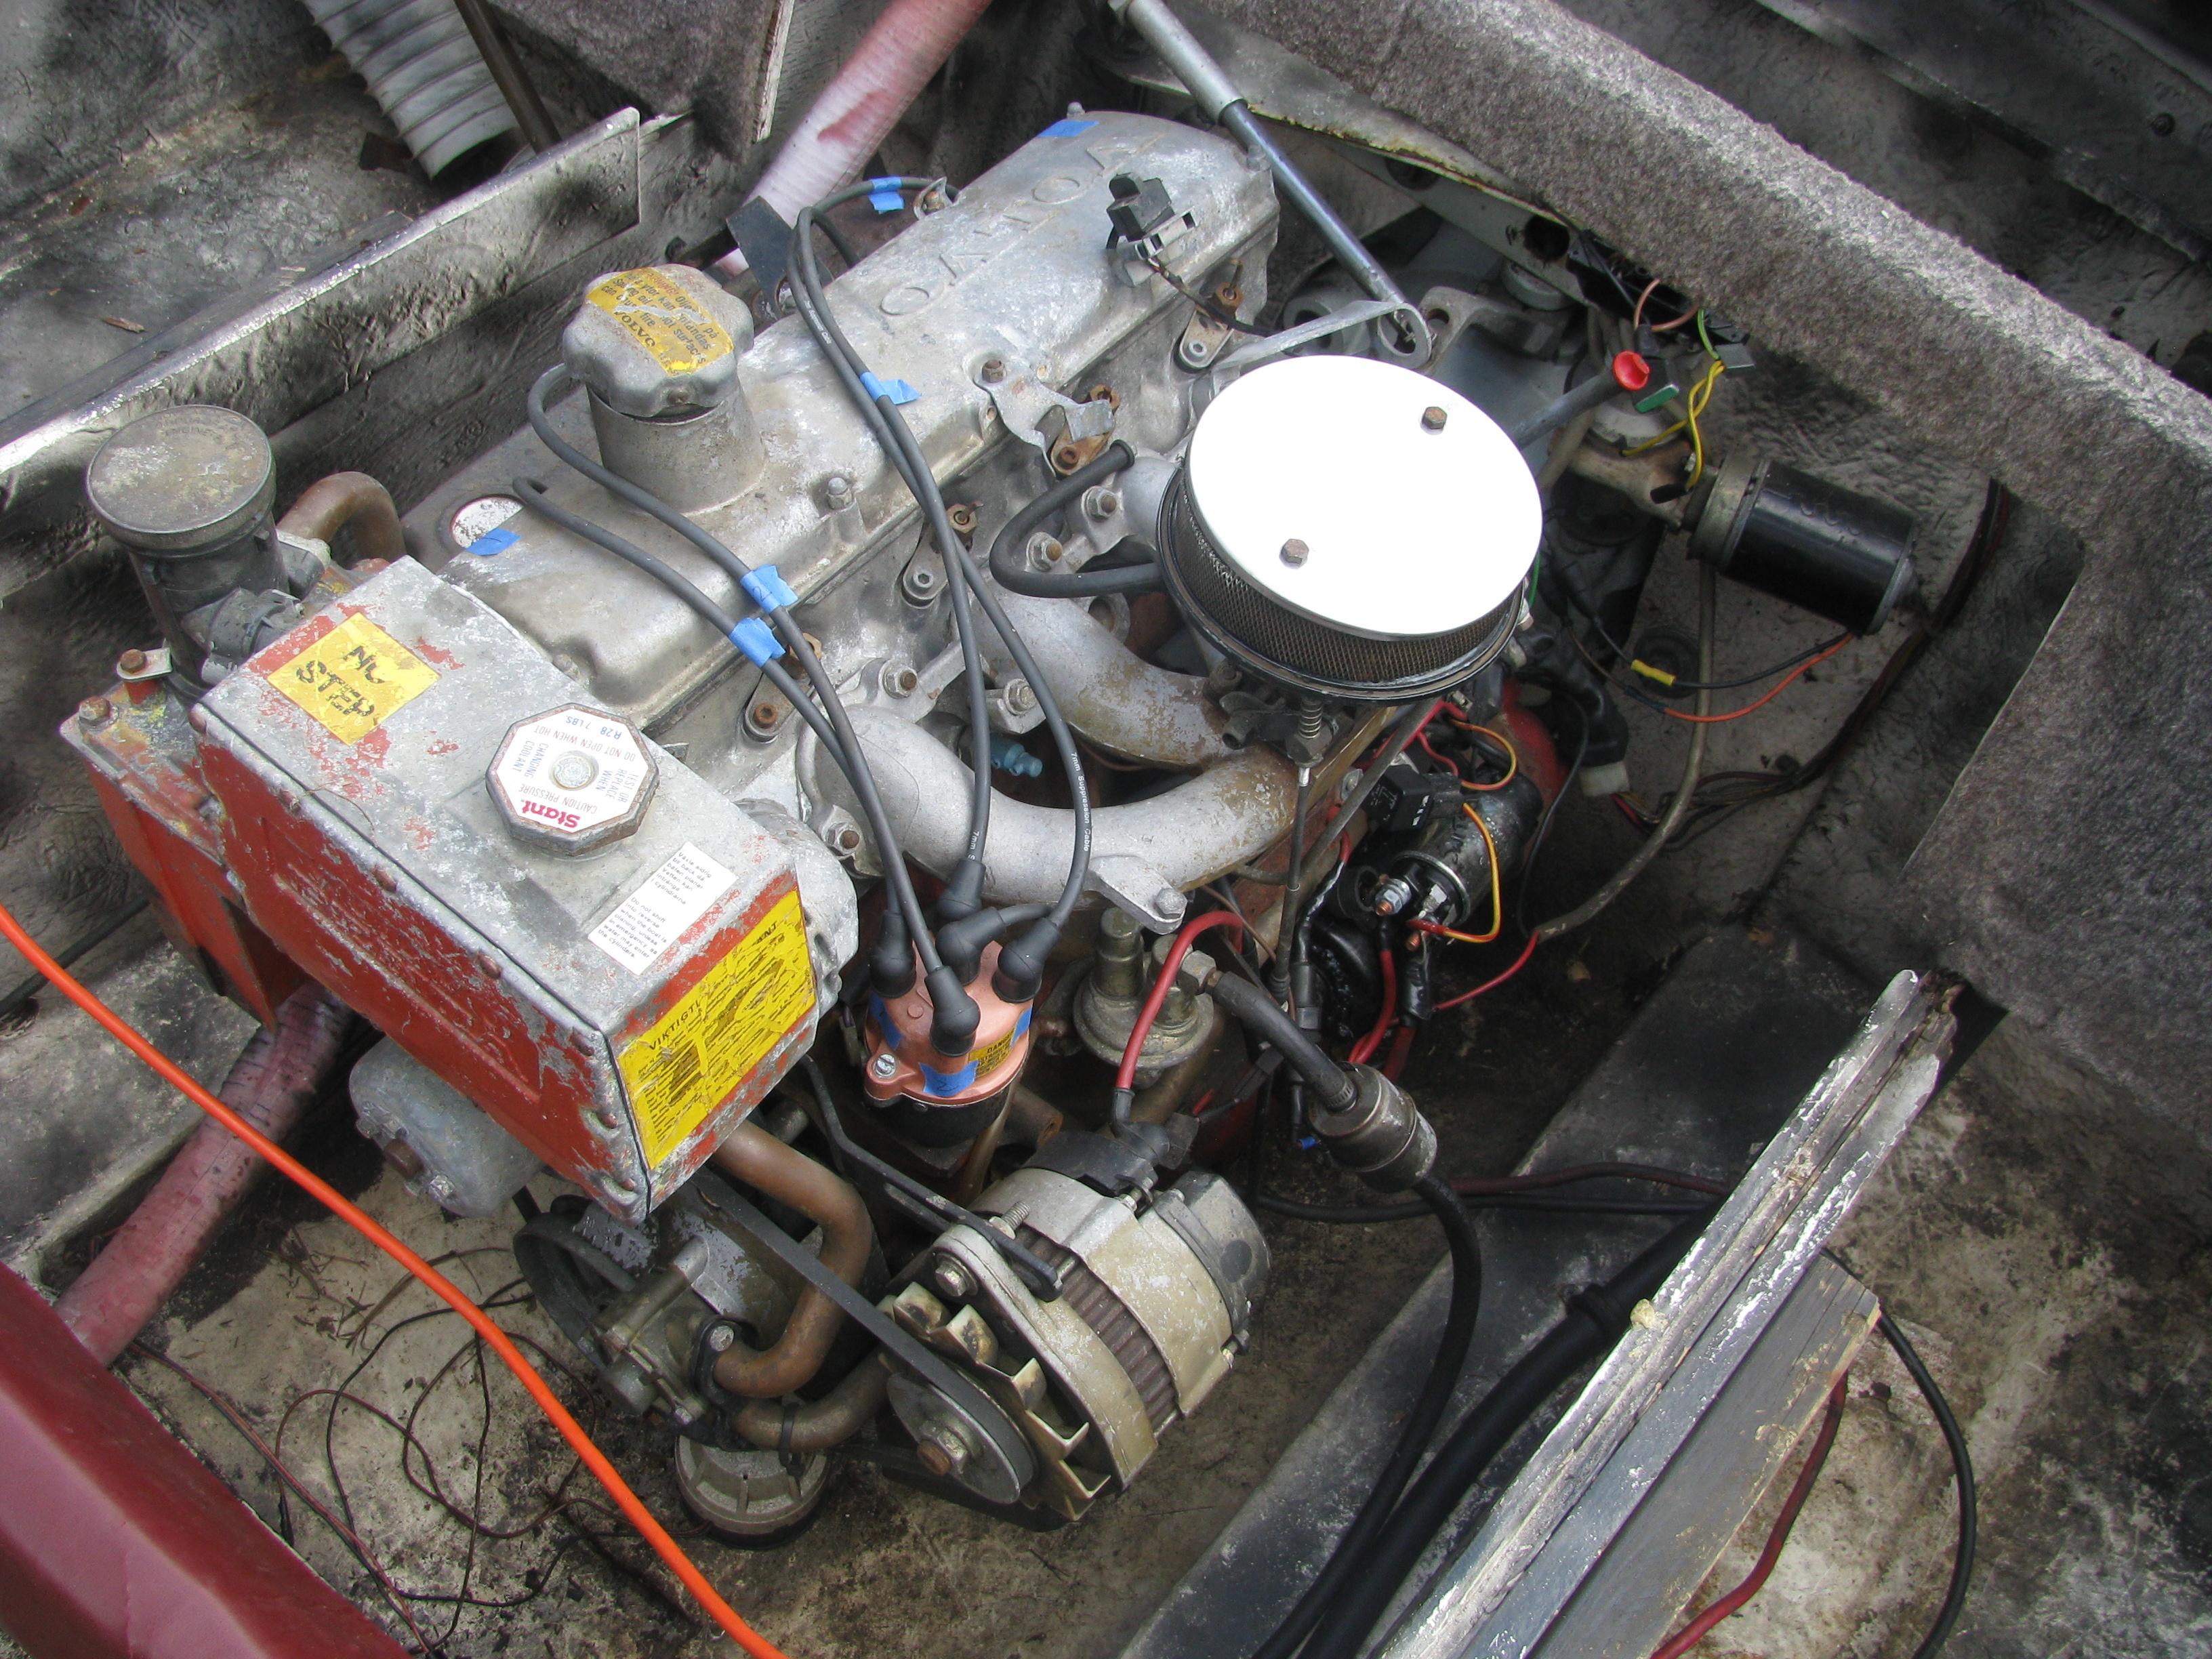 aq125a volvo penta manual basic instruction manual u2022 rh winwithwomen2012 com volvo penta aq131a service manual 03 Volvo Penta 4.3